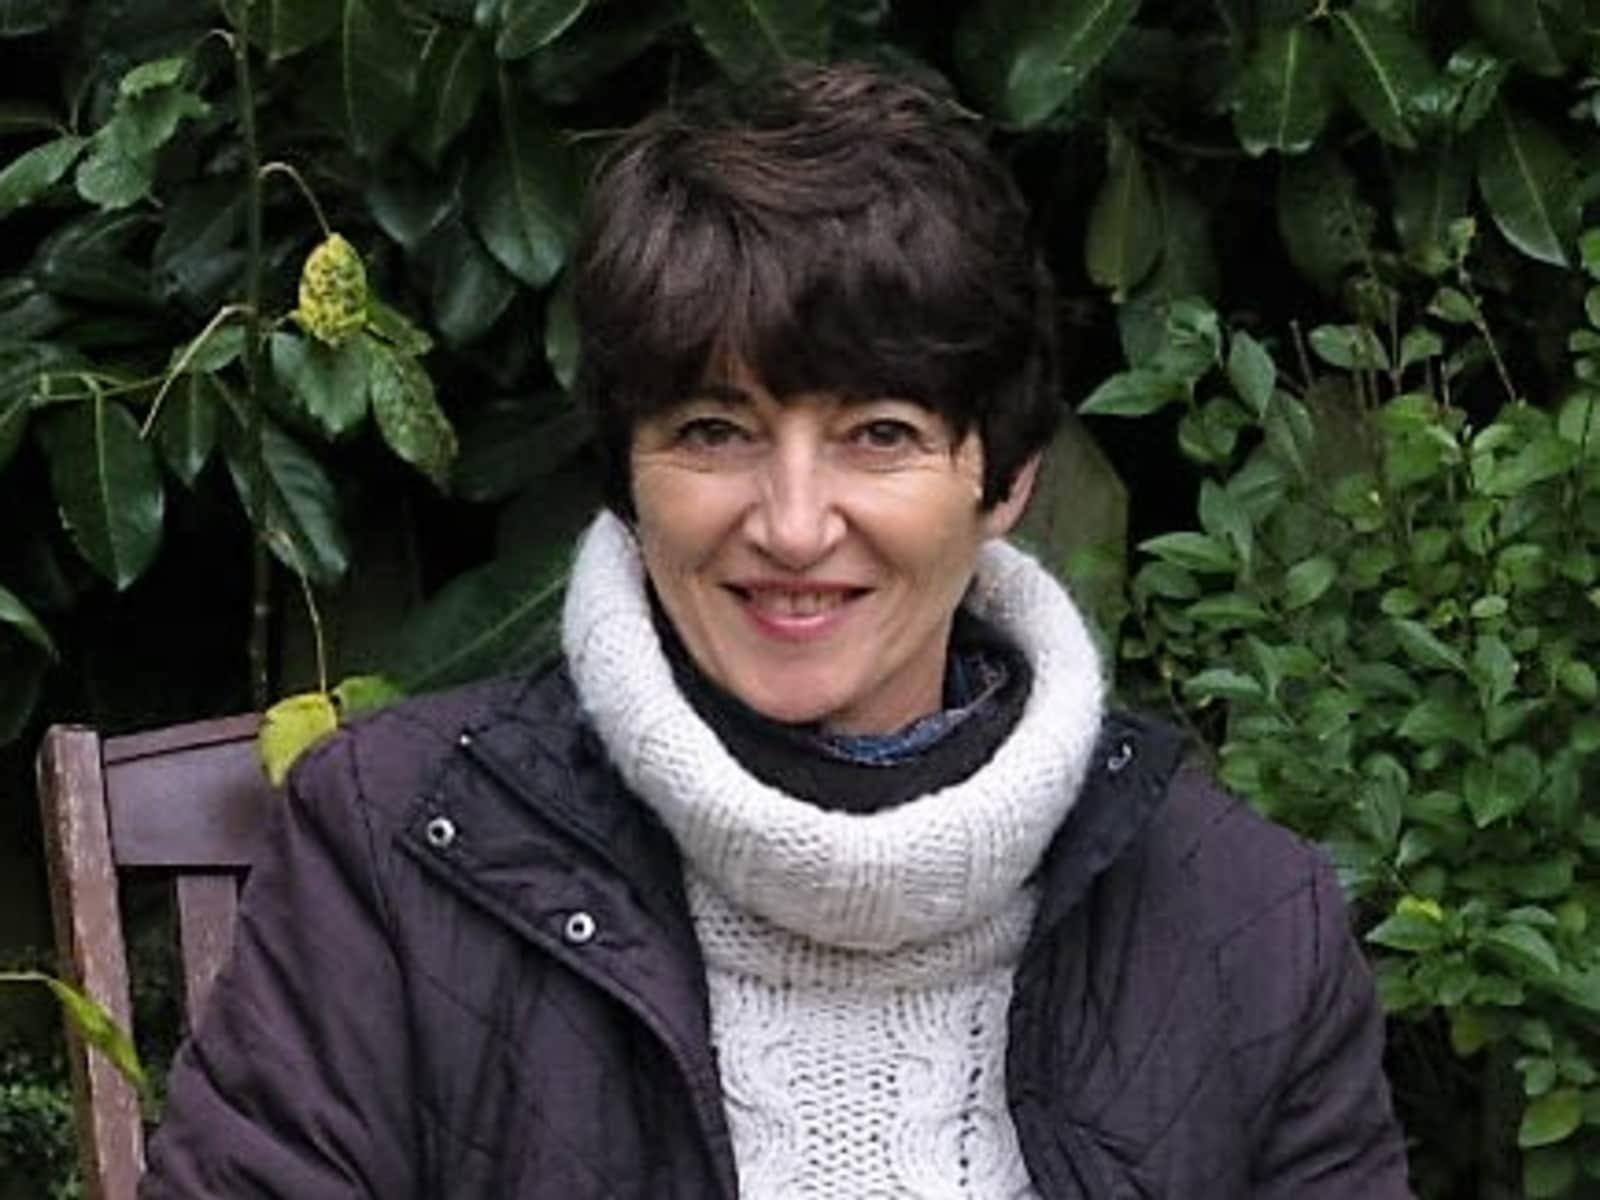 Chantal from Forest Row, United Kingdom